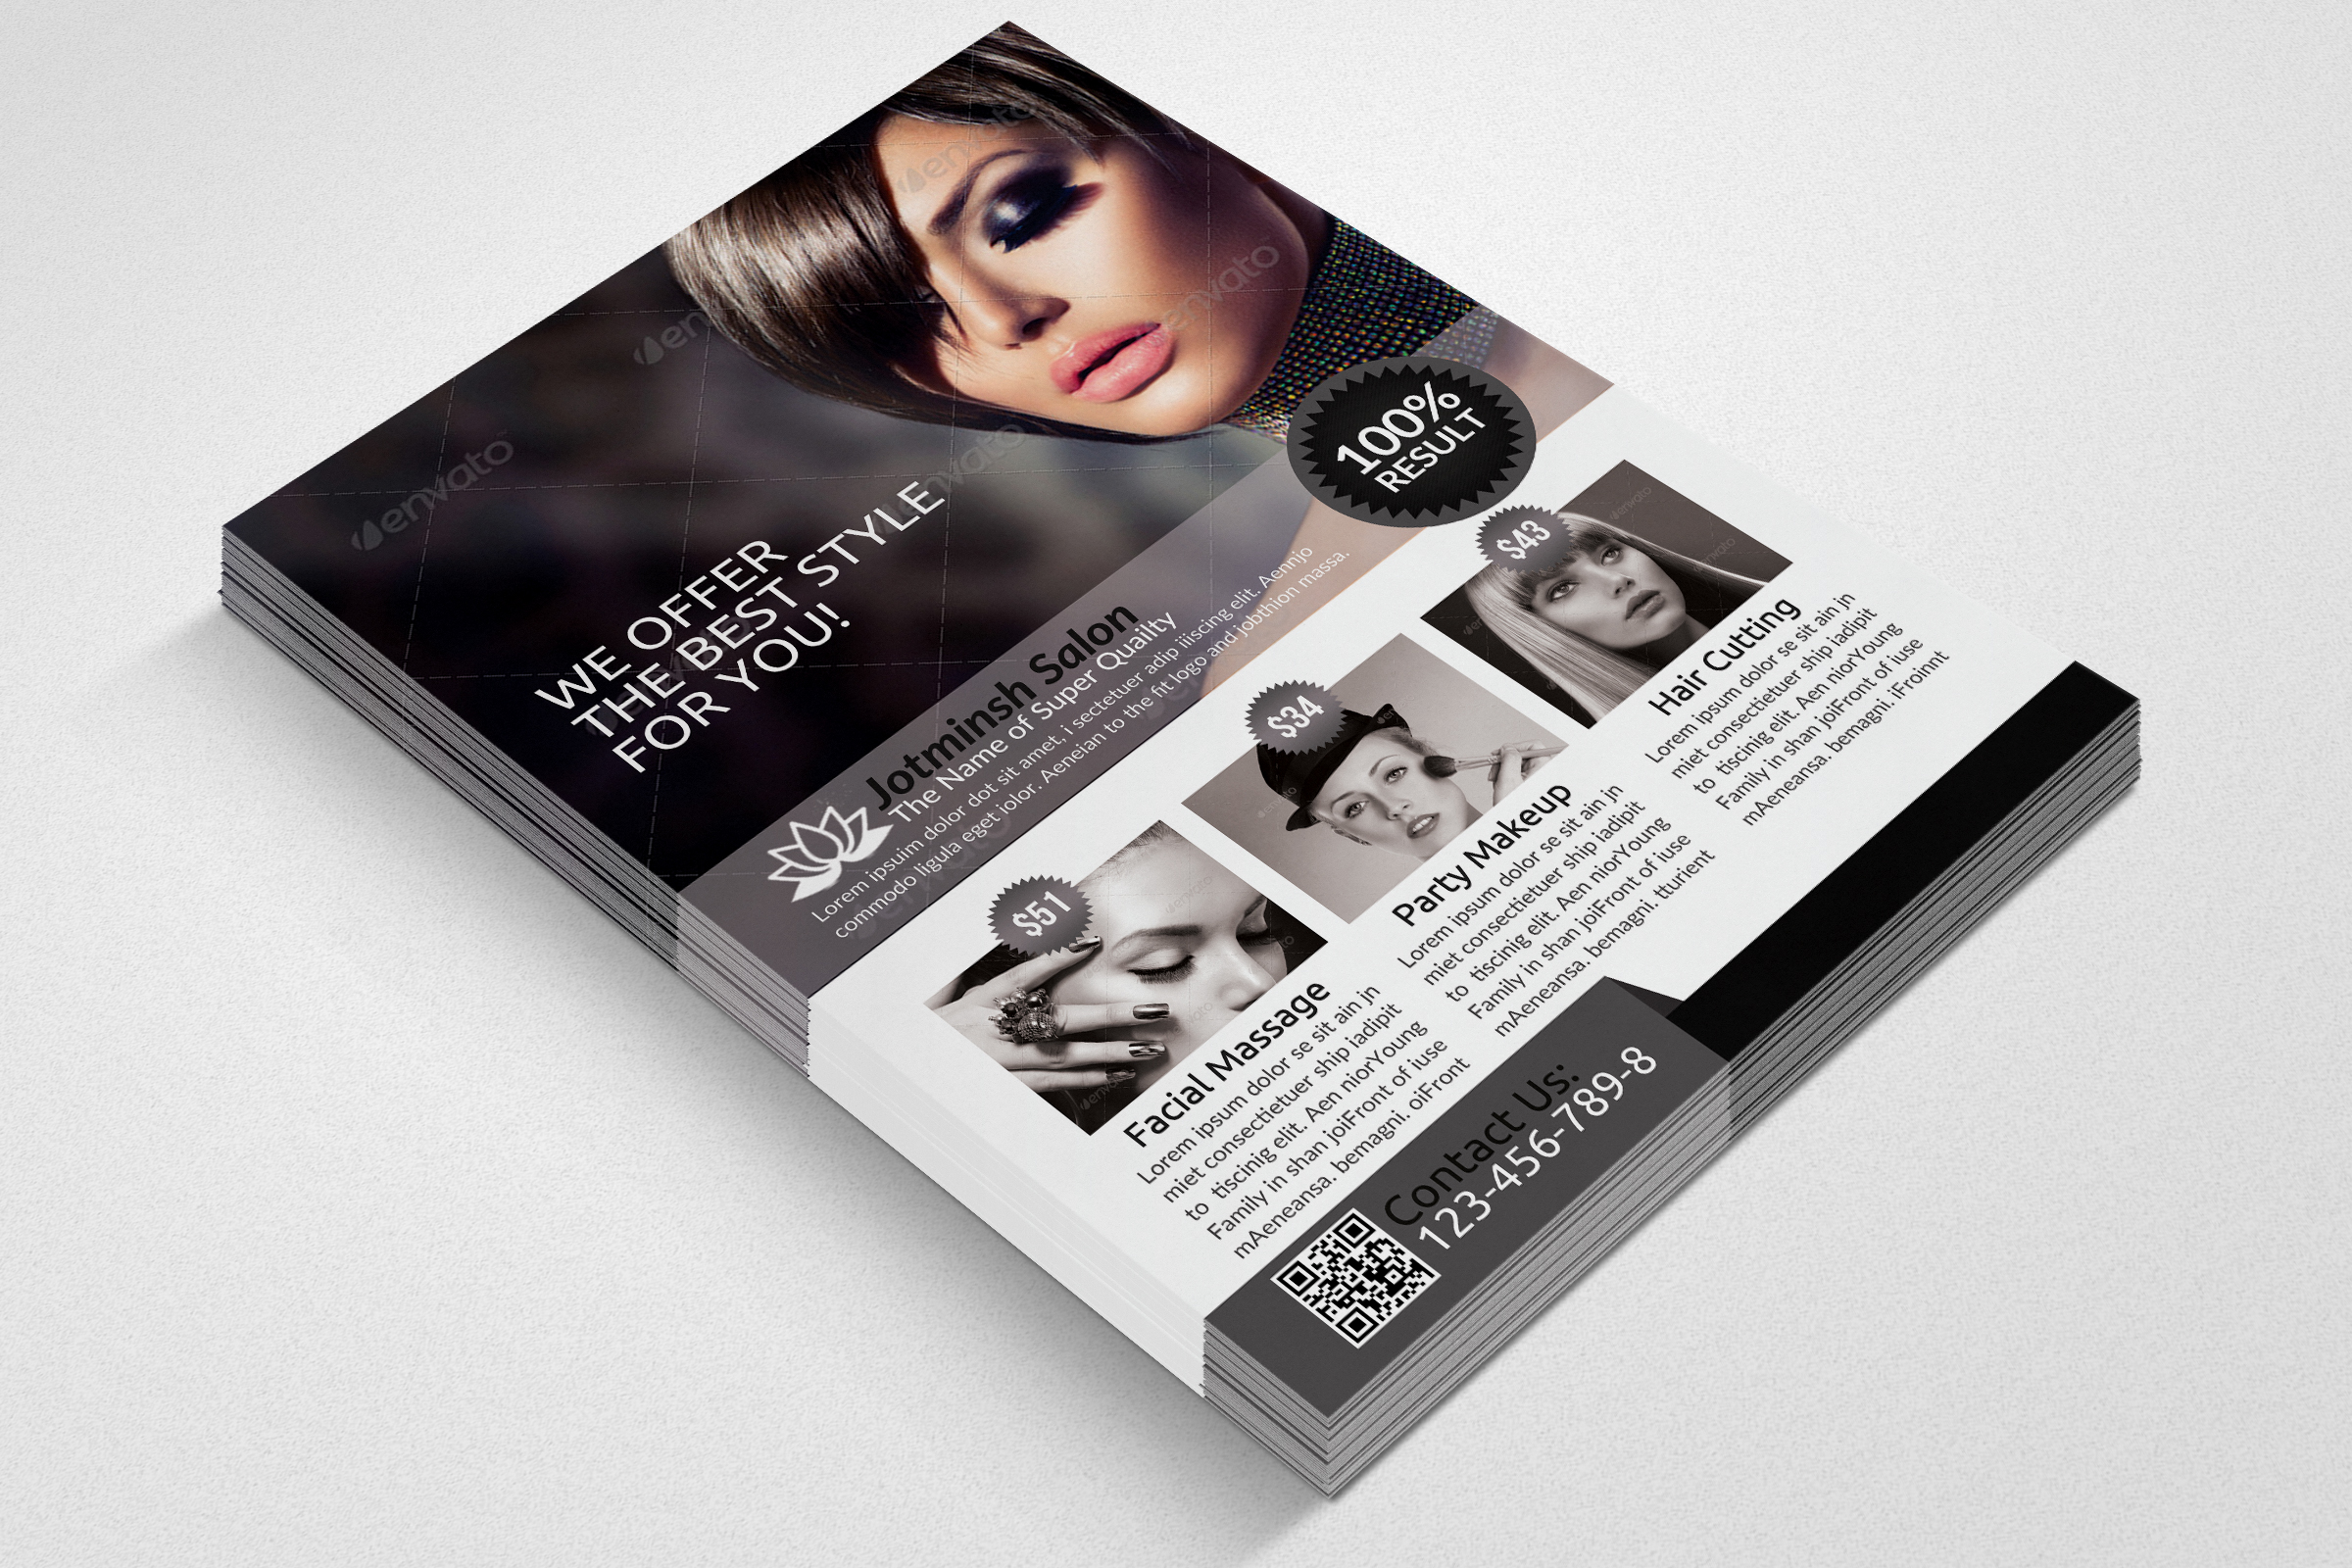 Beauty Salon Flyers example image 2